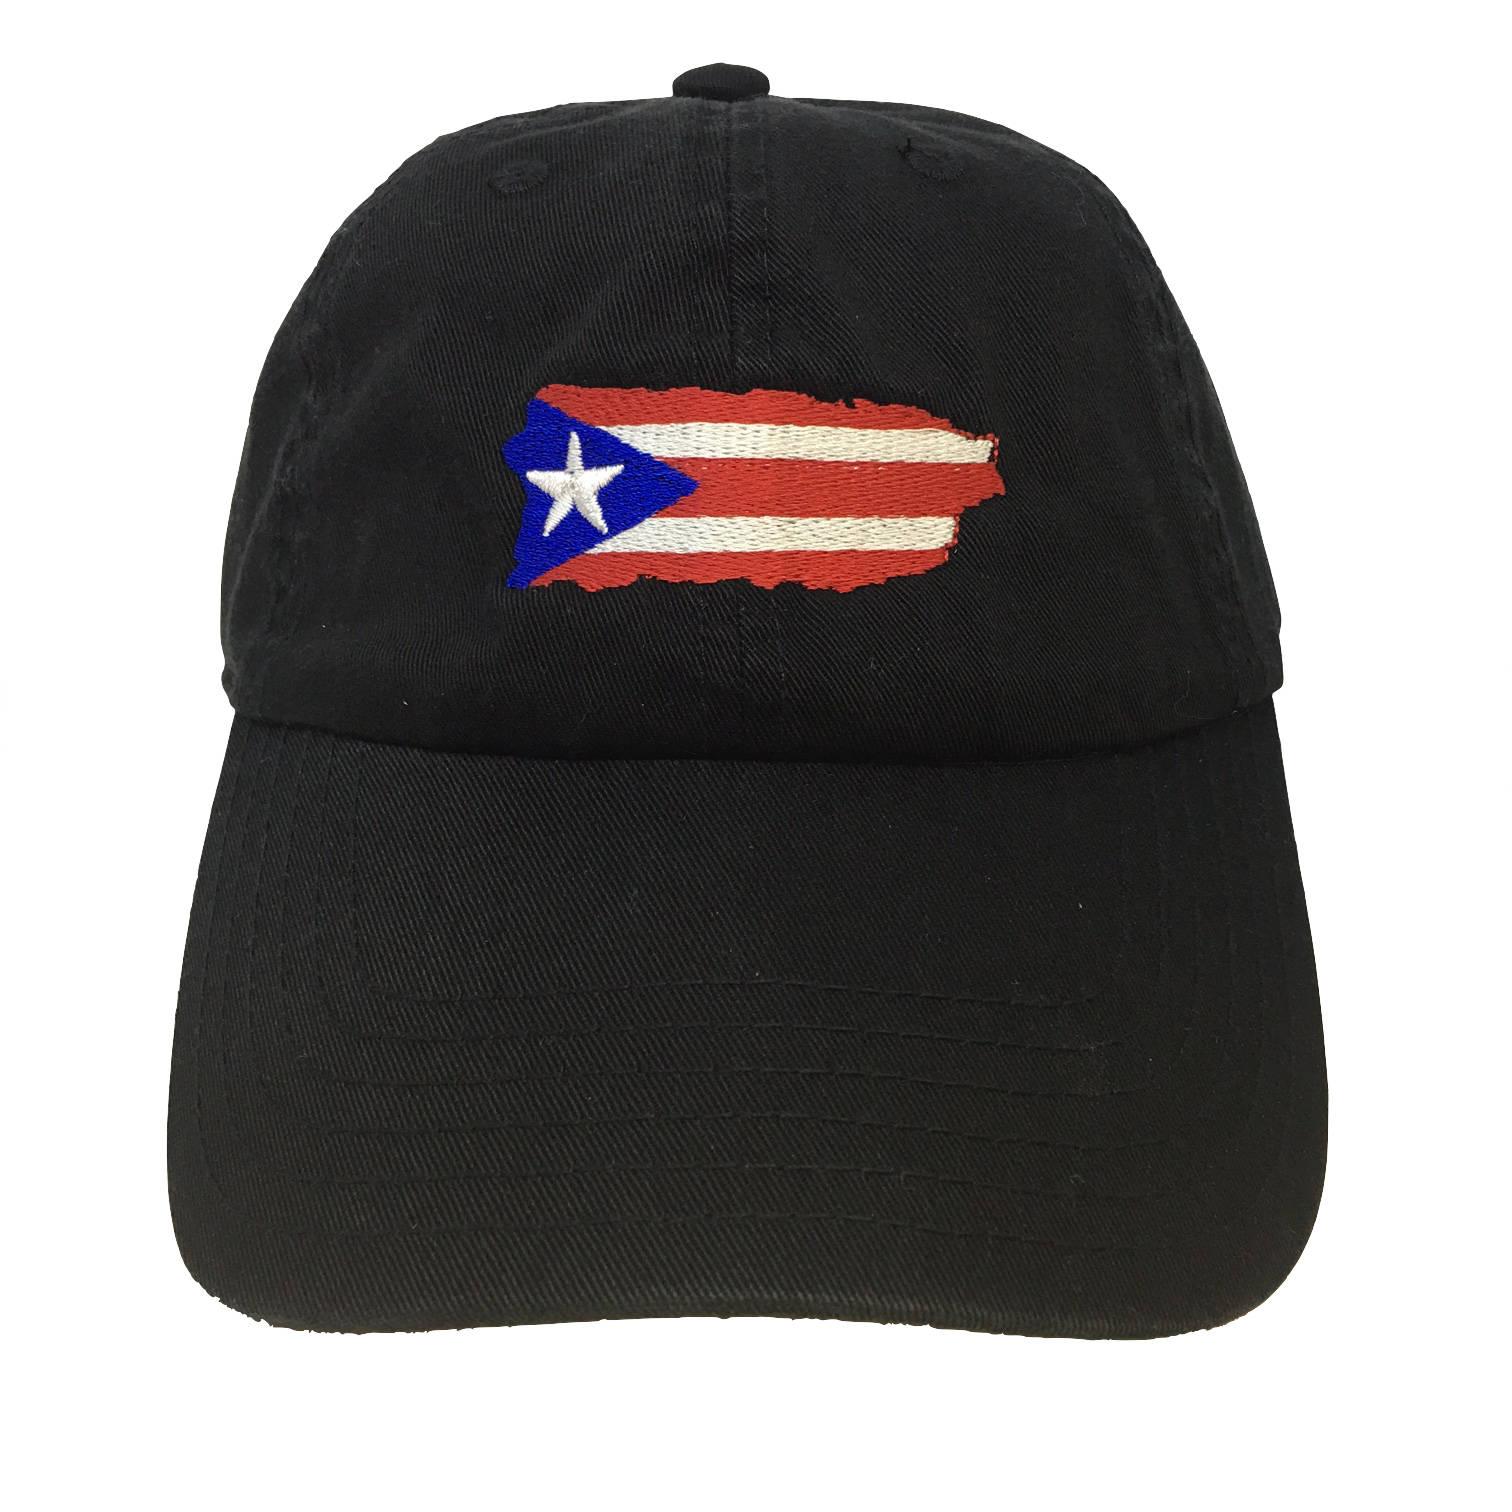 Flag Puerto Rico Island Black Adjustable Strapback Cap Dad Hat  9f85e5100a24